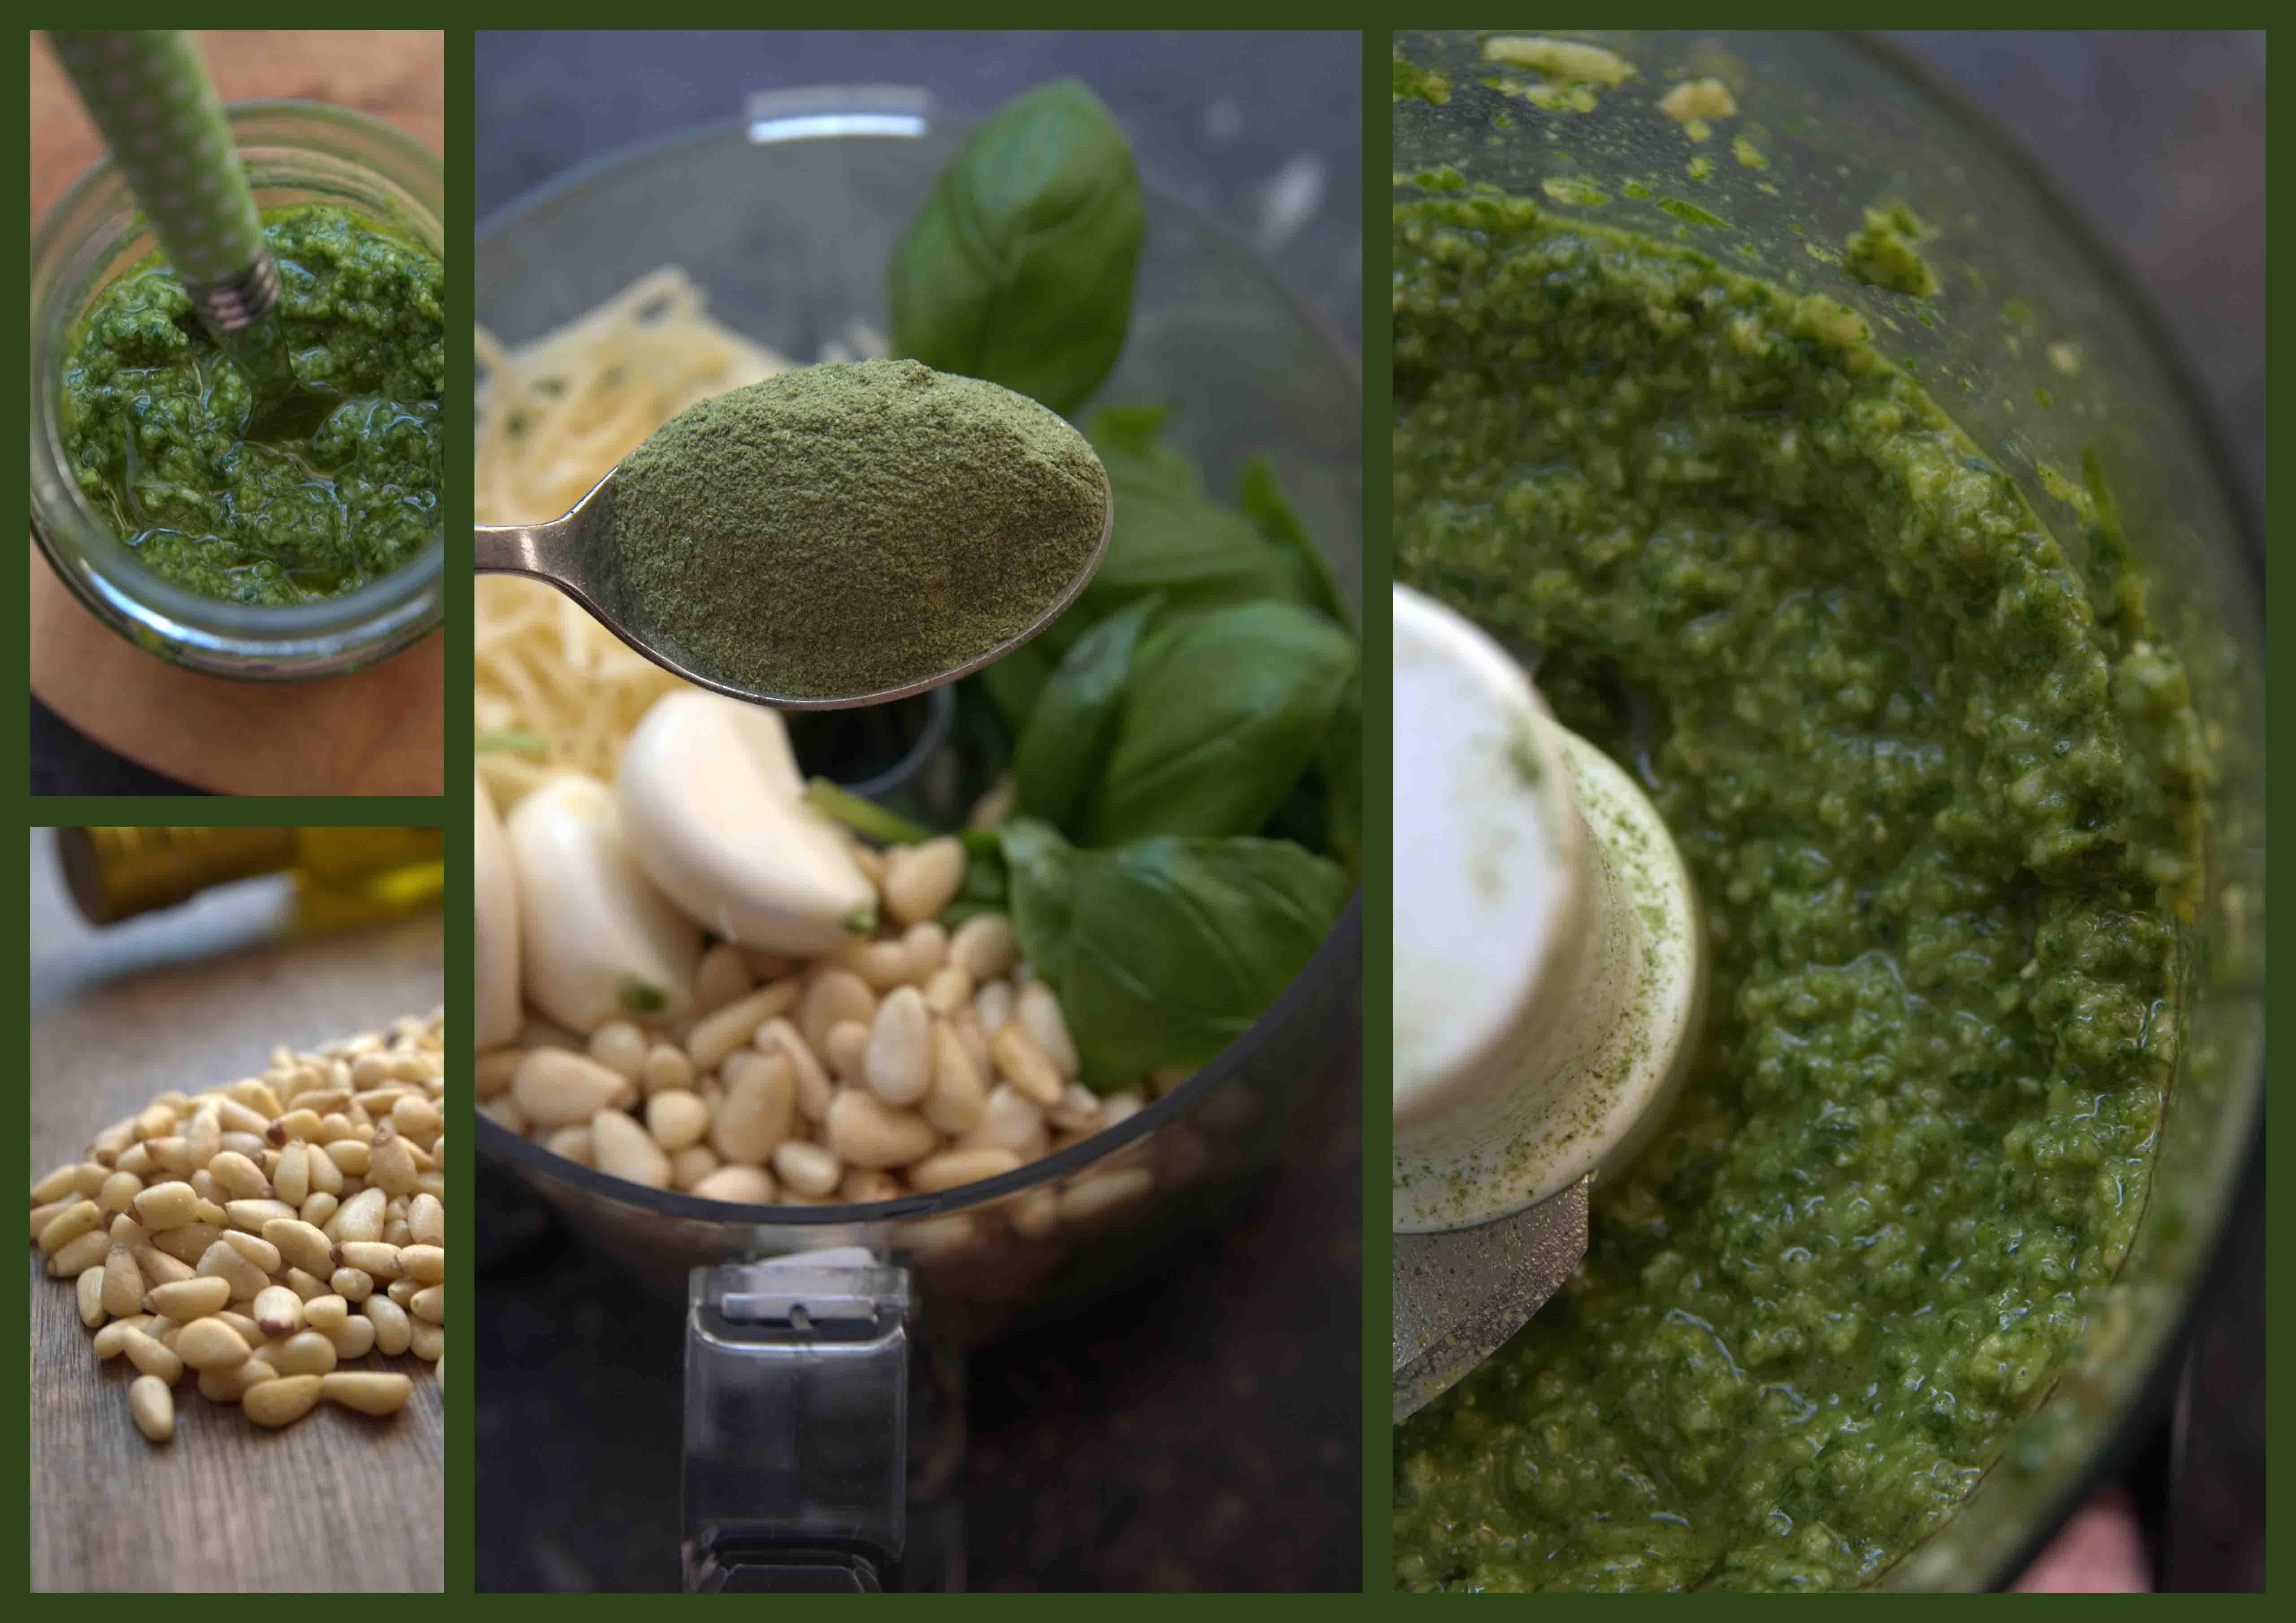 Verse basilicum, Knoflook, Pijnboompitten, Parmezaanse kaas, spinazie poeder, olijfolie